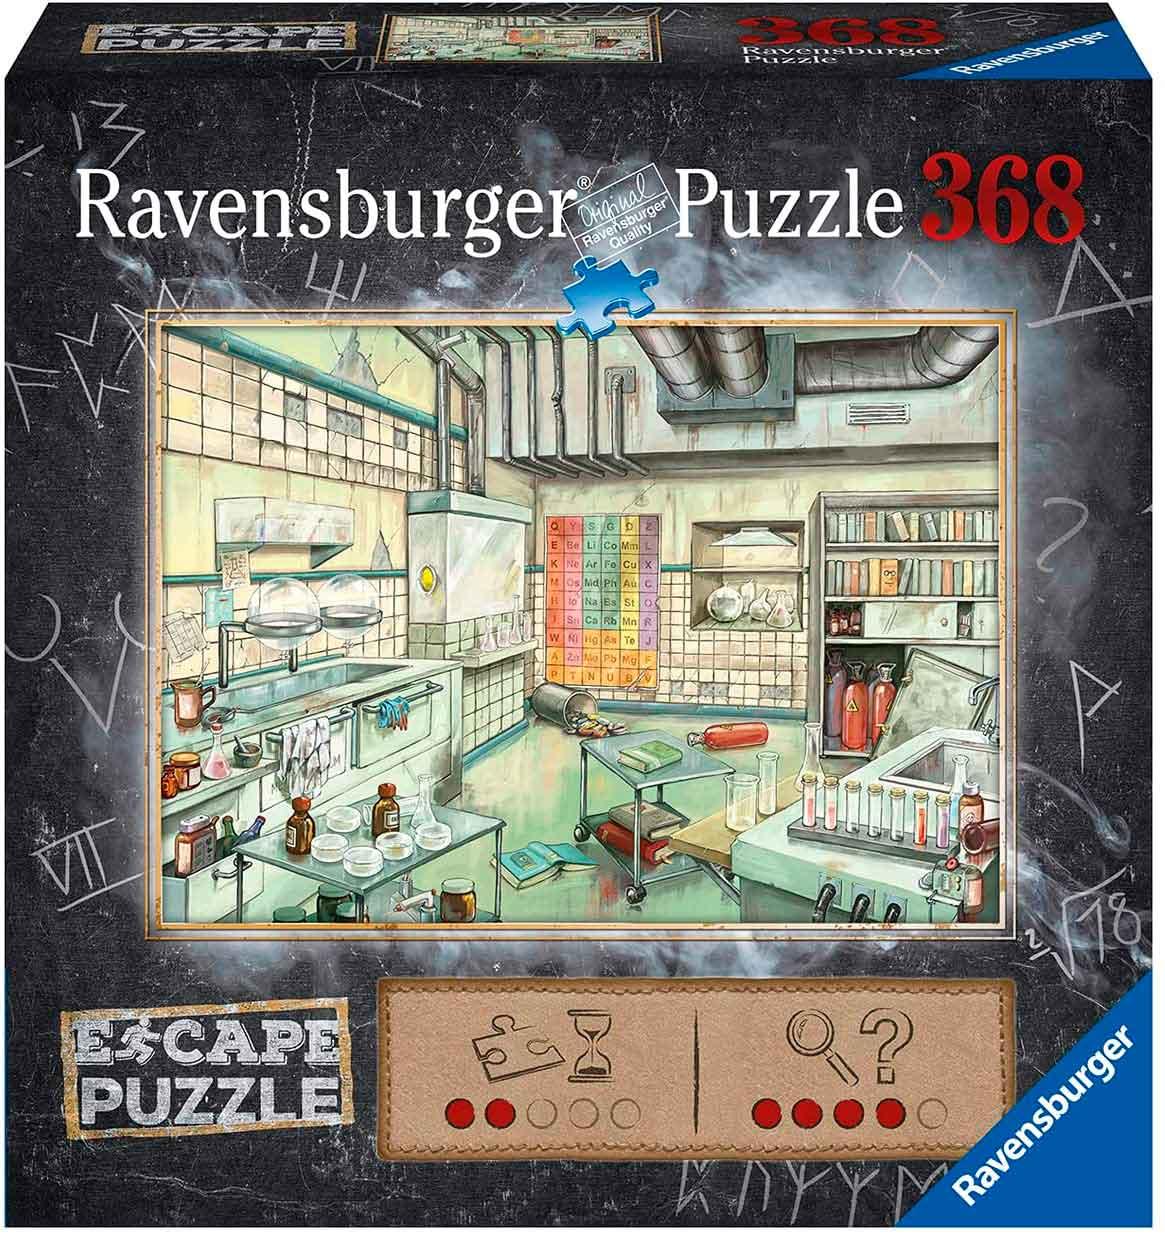 Puzzle Escape Ravensburger Laboratorio de Química de 368 Piezas